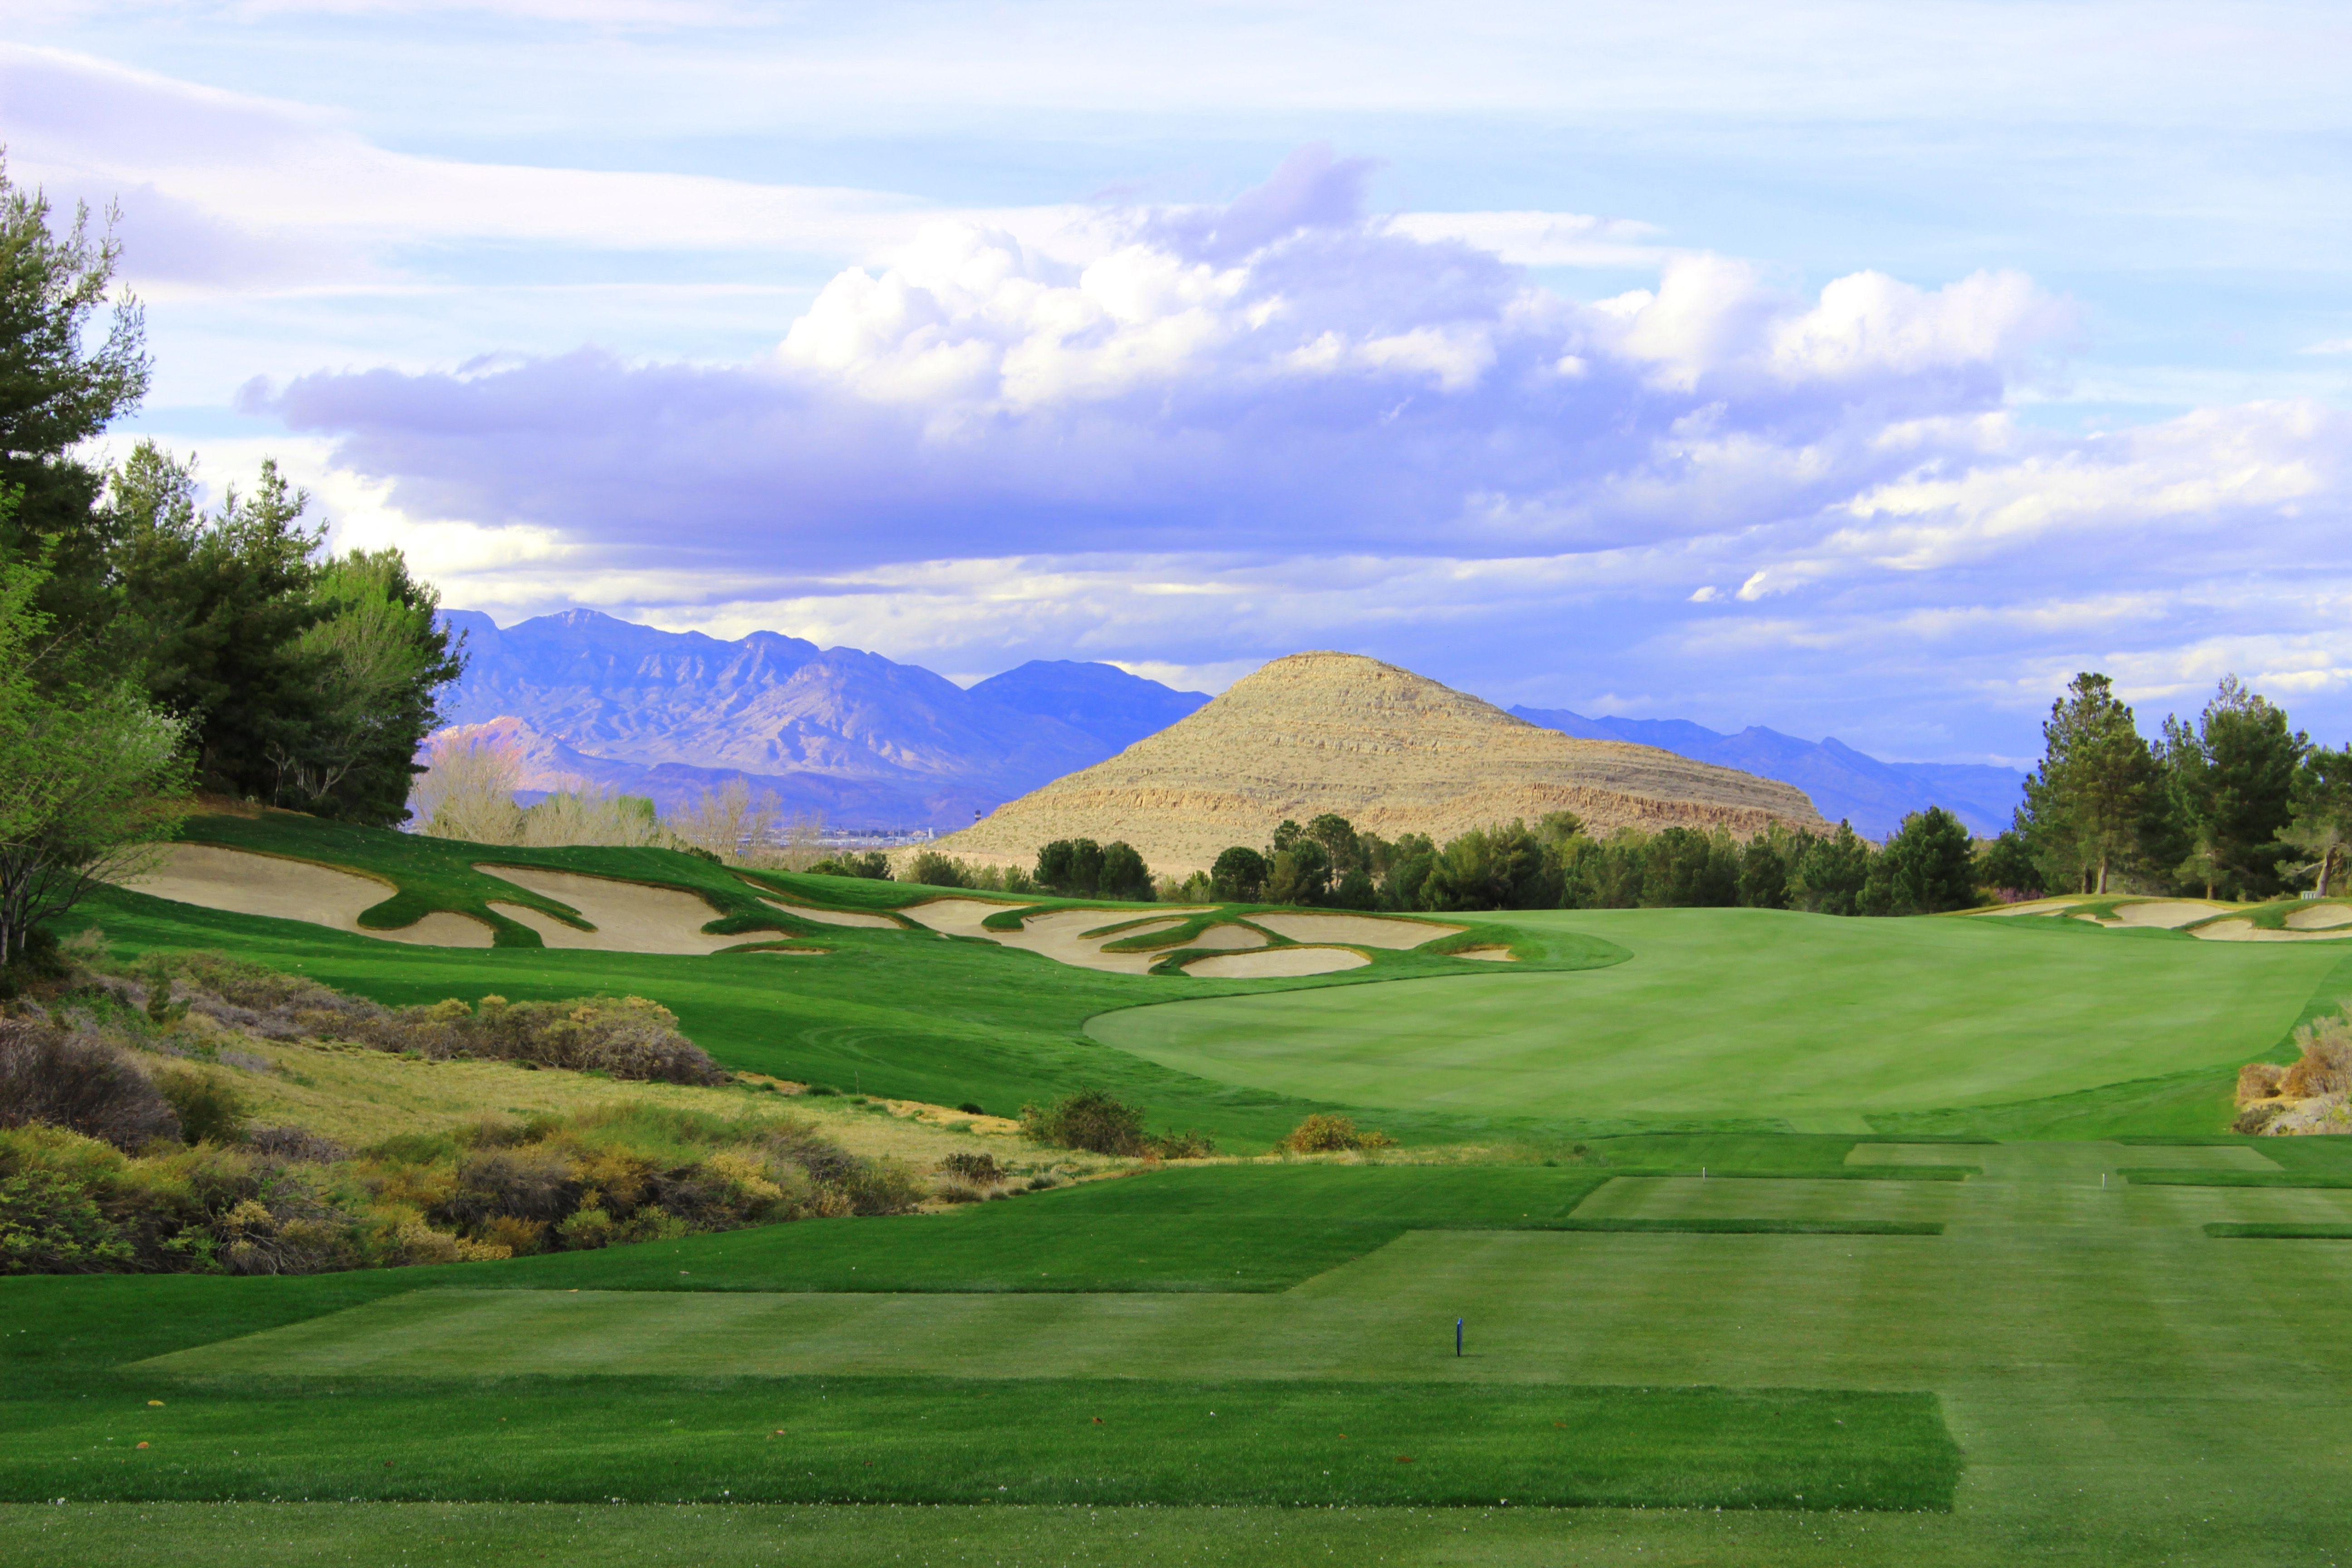 Golf In Beautiful Southern Highlands Lasvegas Www Findinghomesinlasvegas